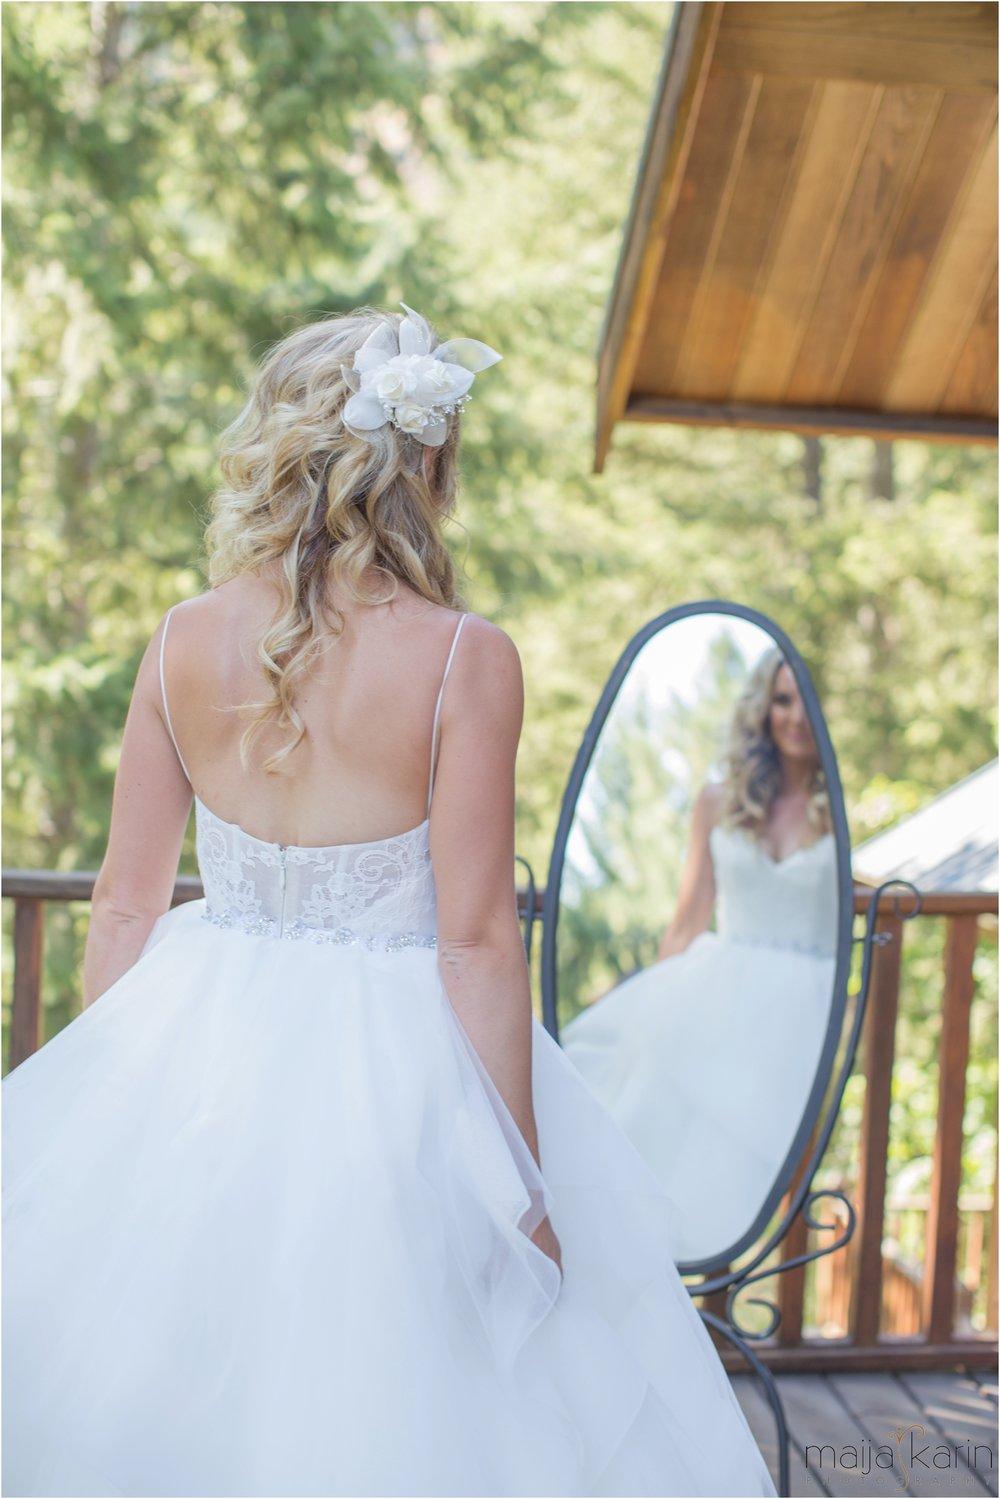 silvara-winery-wedding-maija-karin-photography_0014.jpg